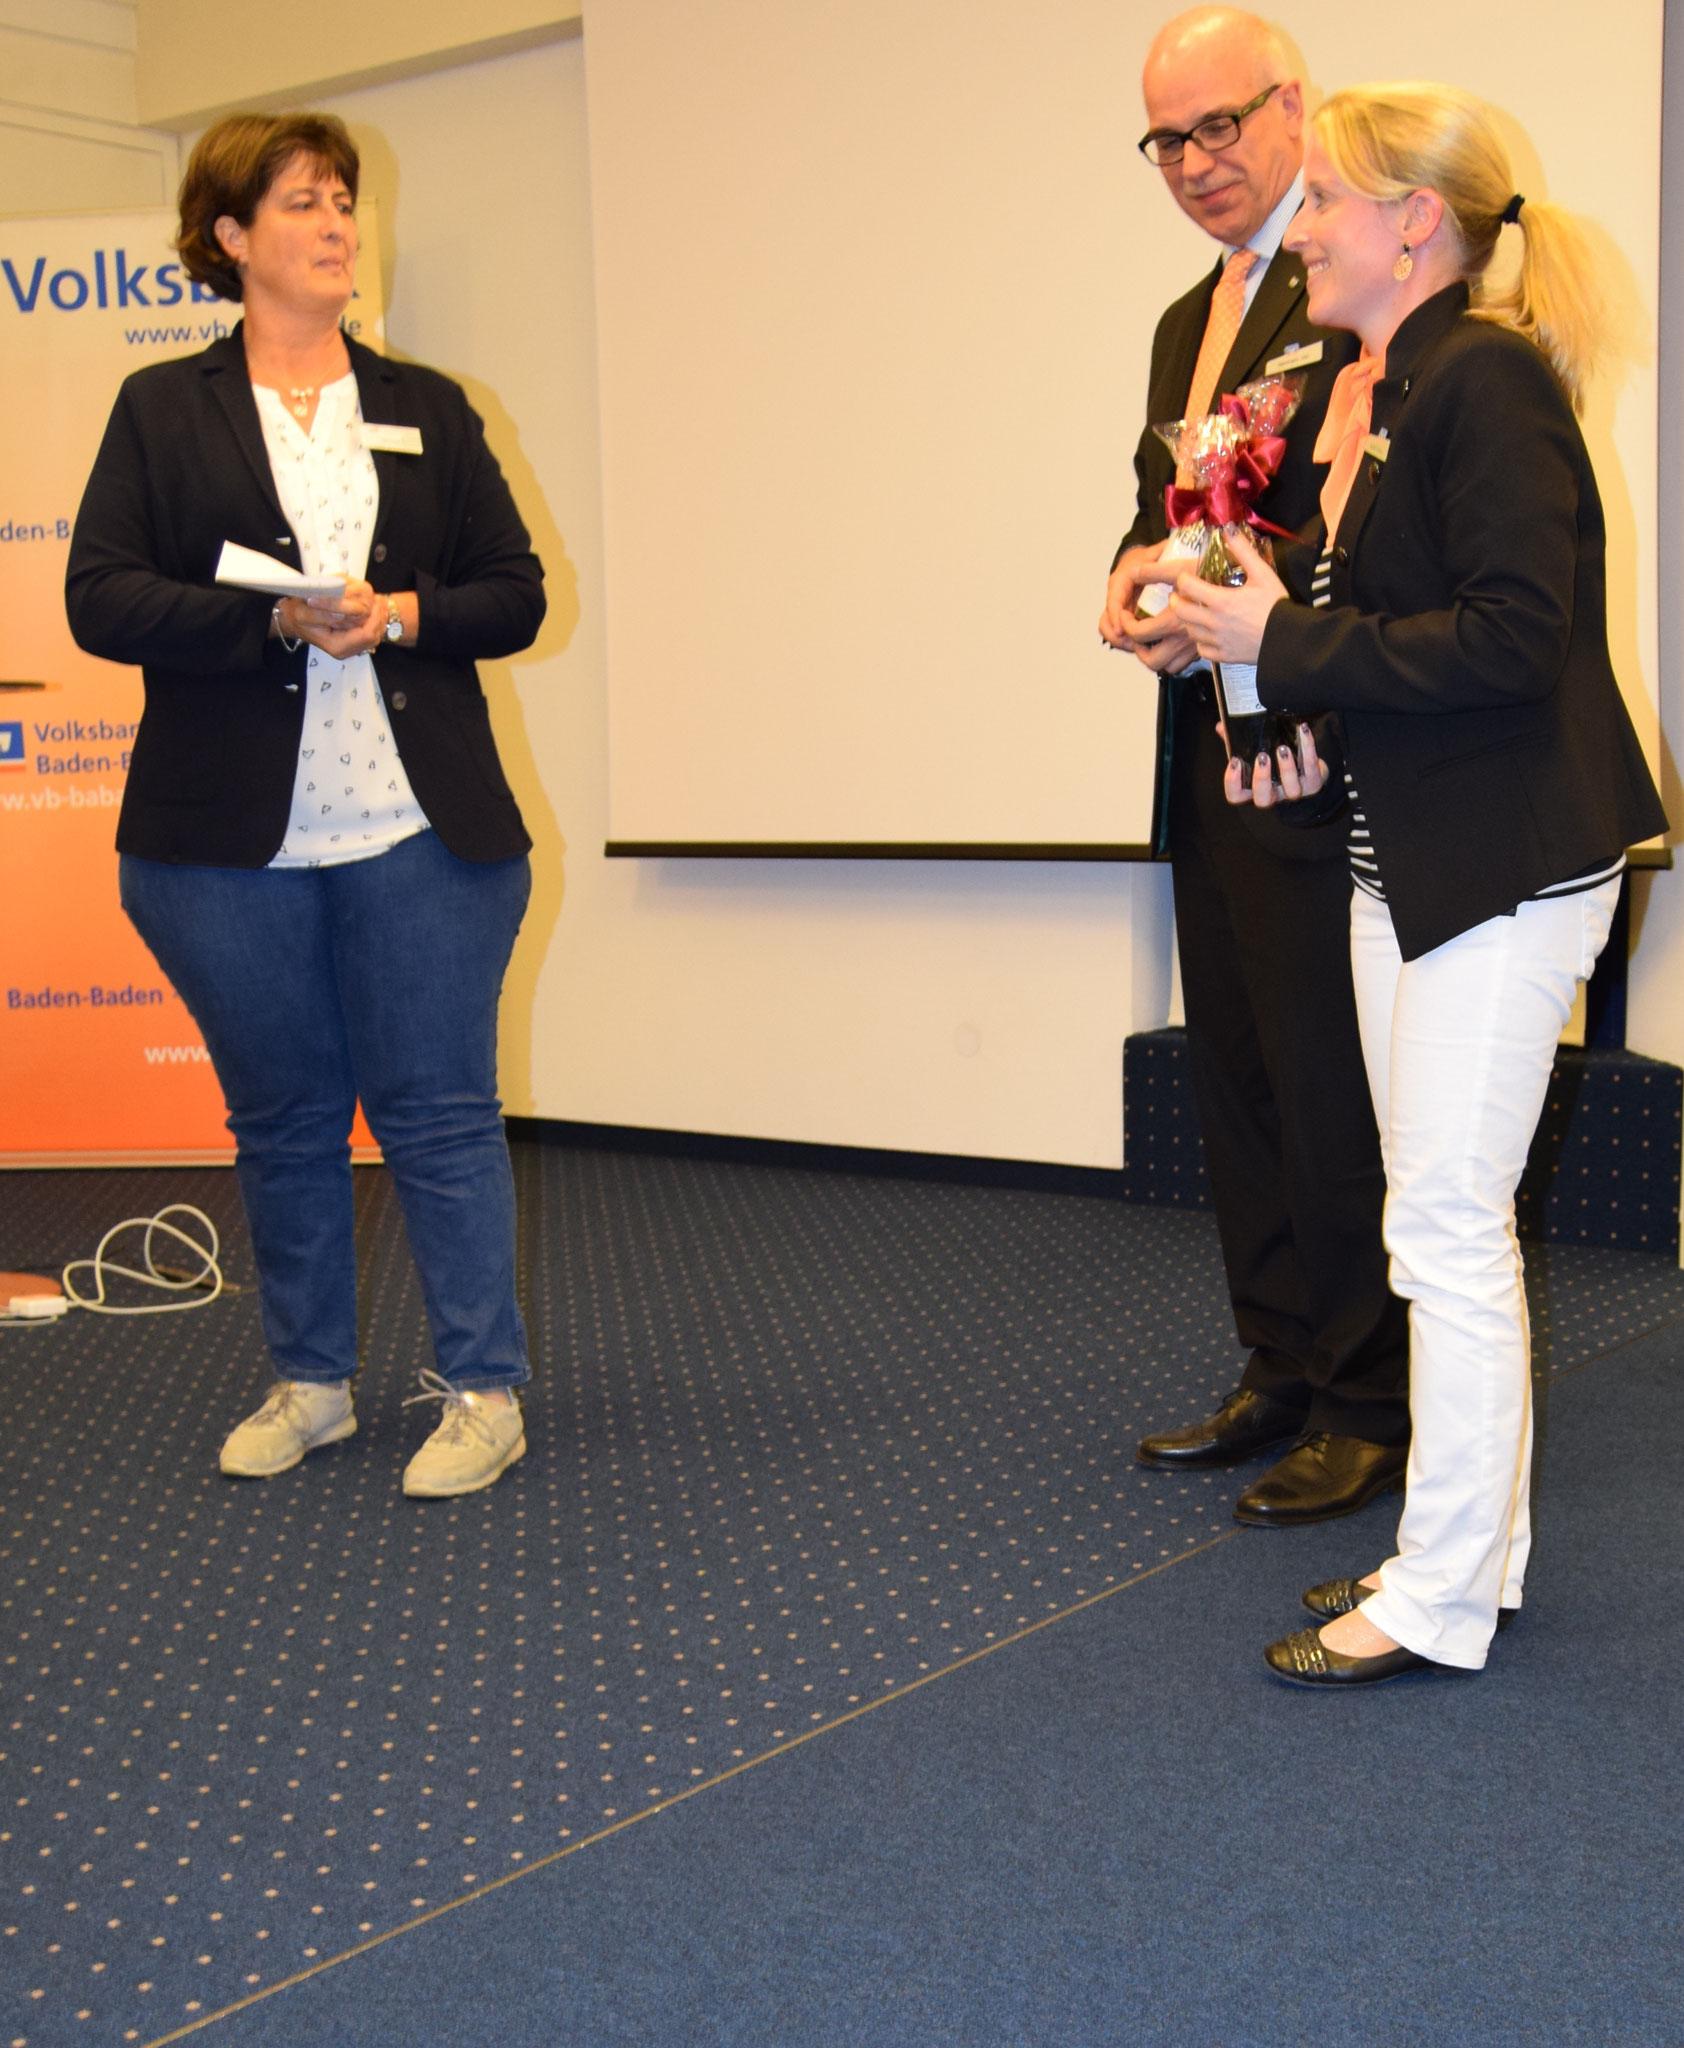 09-17 Dank durch Annette Hermes-Schmid an Fr. Fischer u.Herrn Veit, Voba